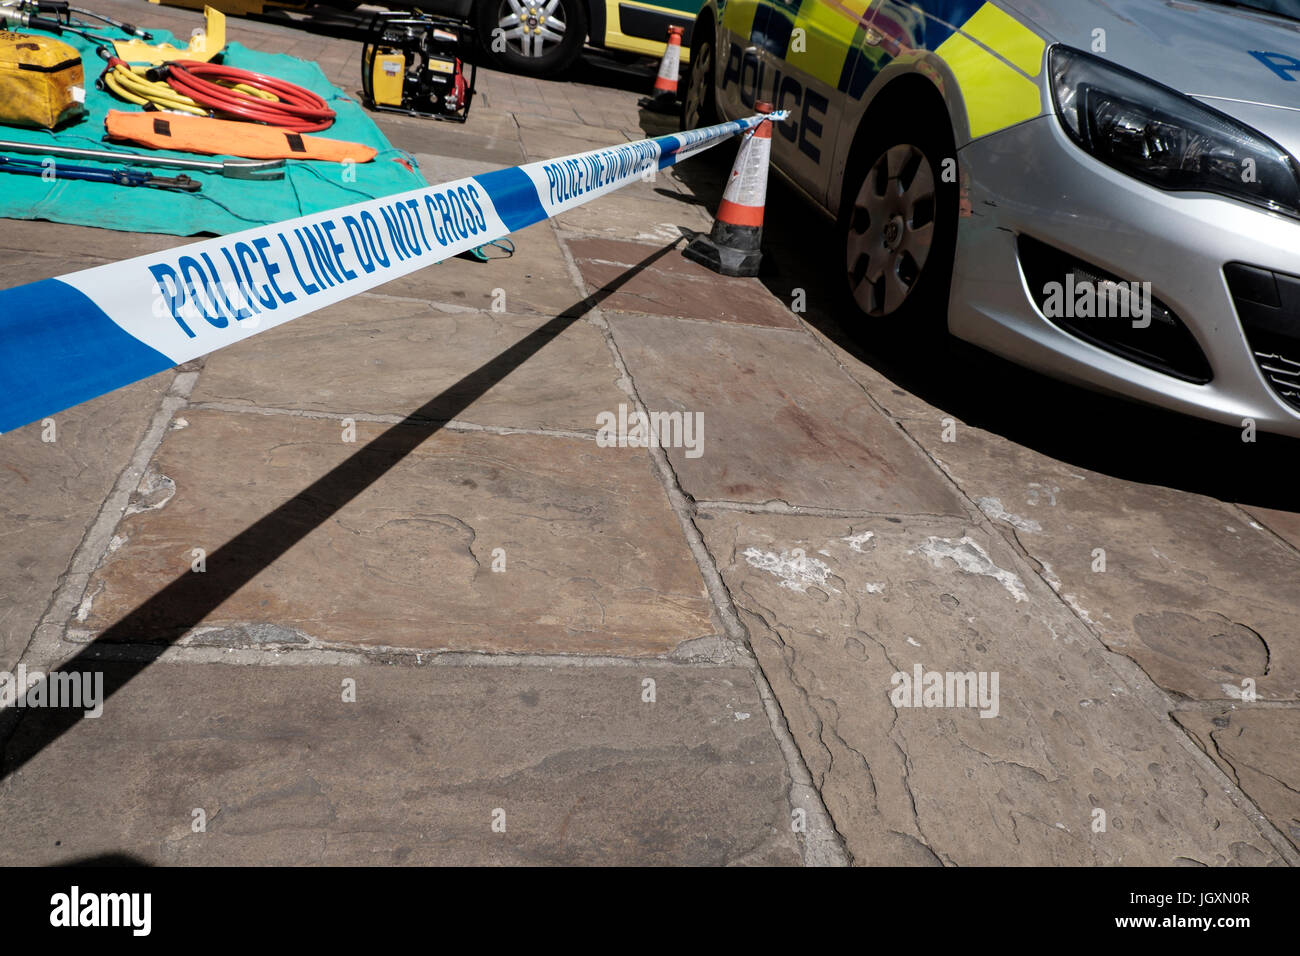 Crime scene - police line: do not cross tape in the center centre of York, UK. - Stock Image